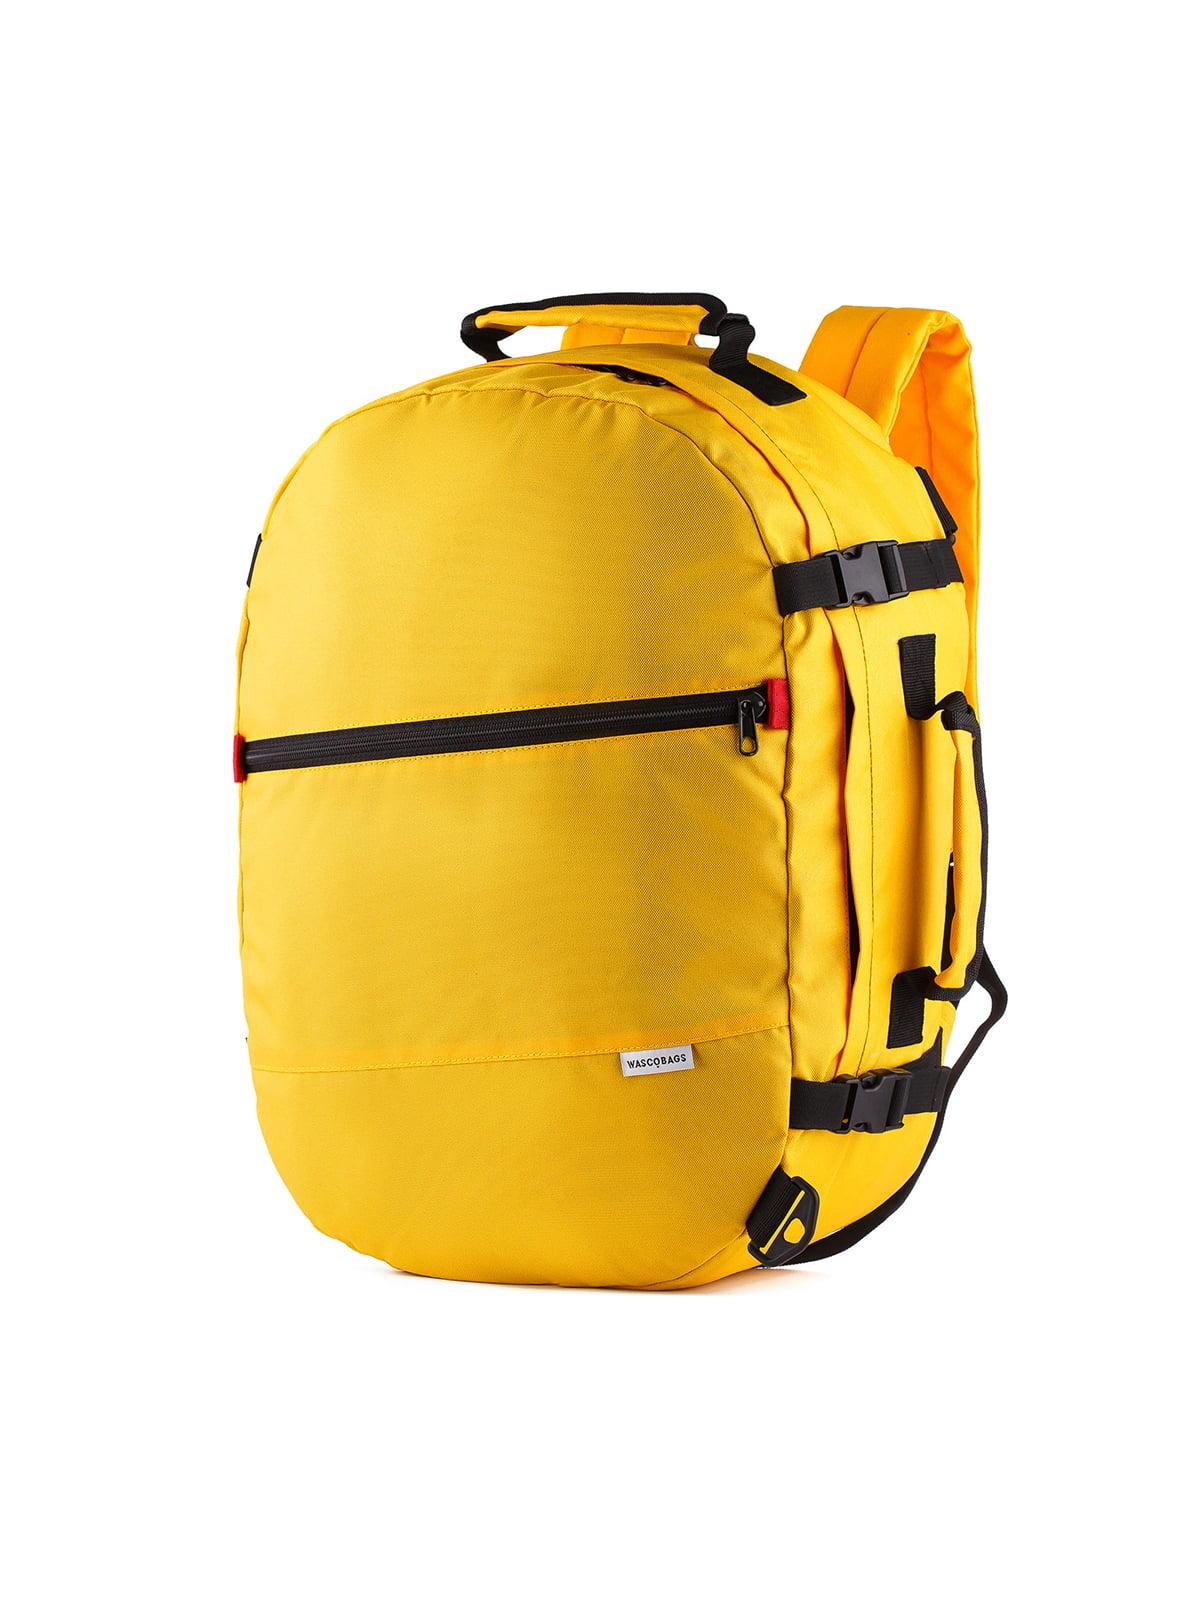 Сумка-рюкзак для ручной клади желтая (50х35х20 см) | 5514217